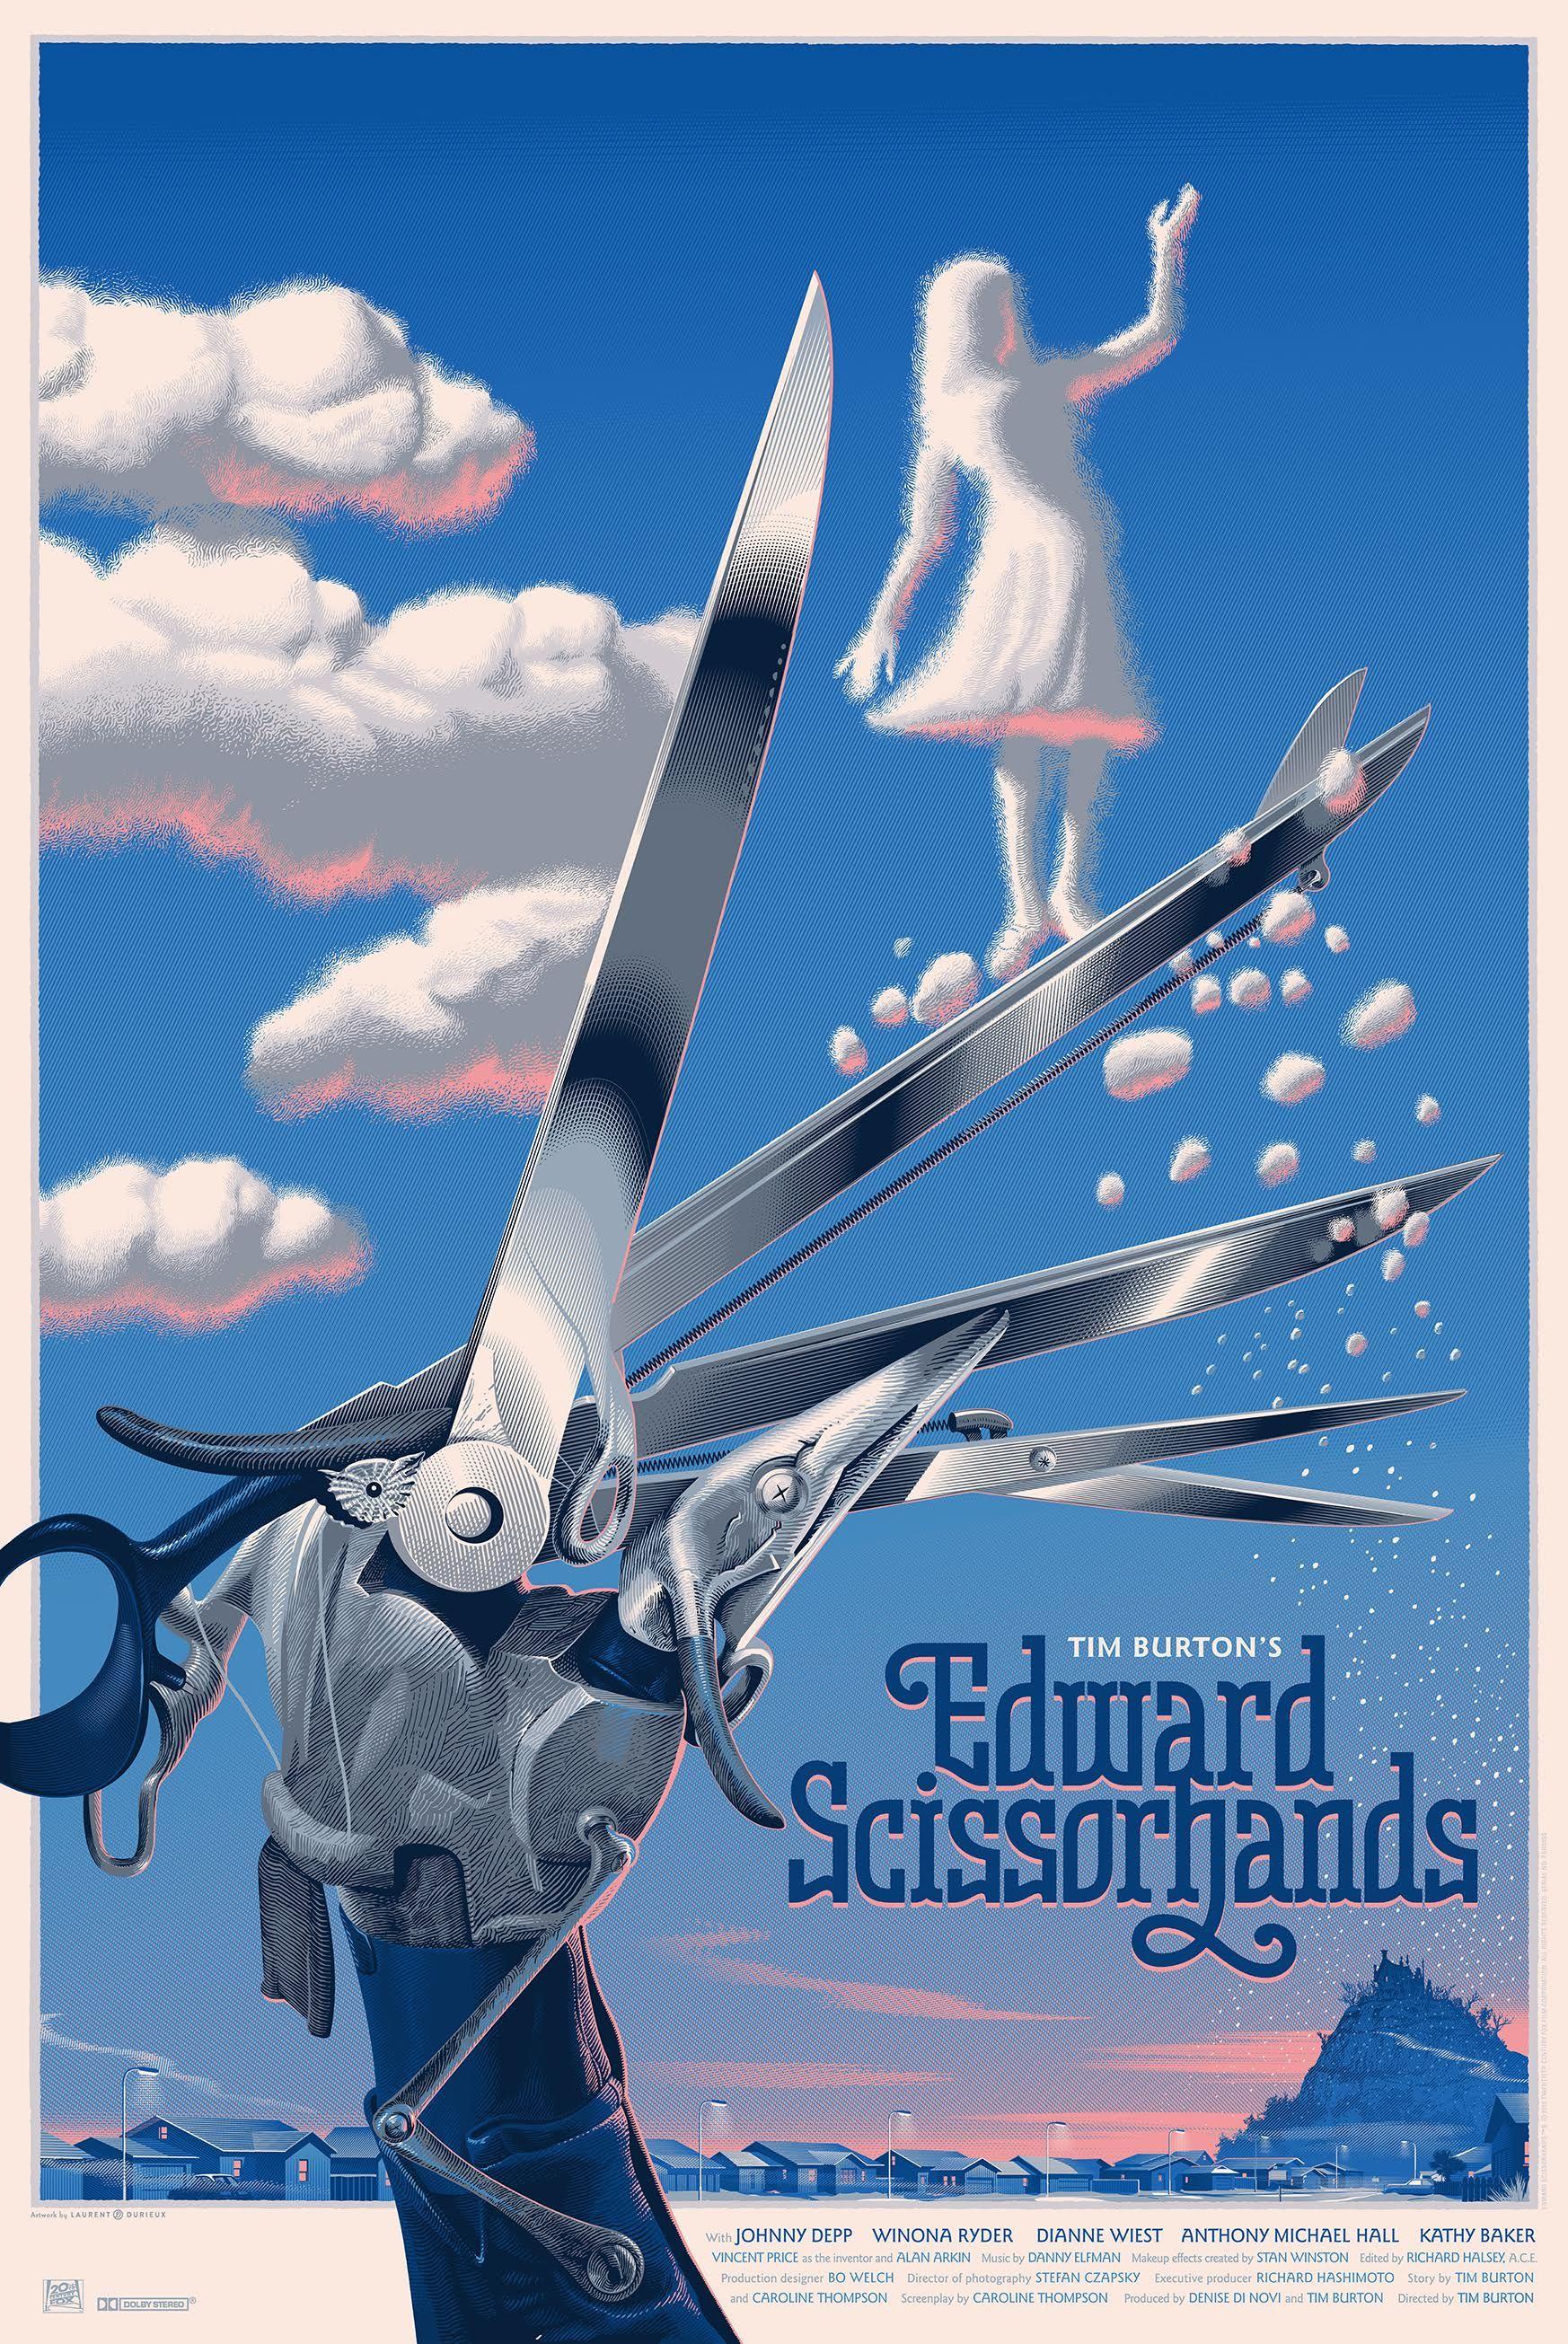 Edward Scissorhands Poster Laurent Durieux Jpg 1746 2610